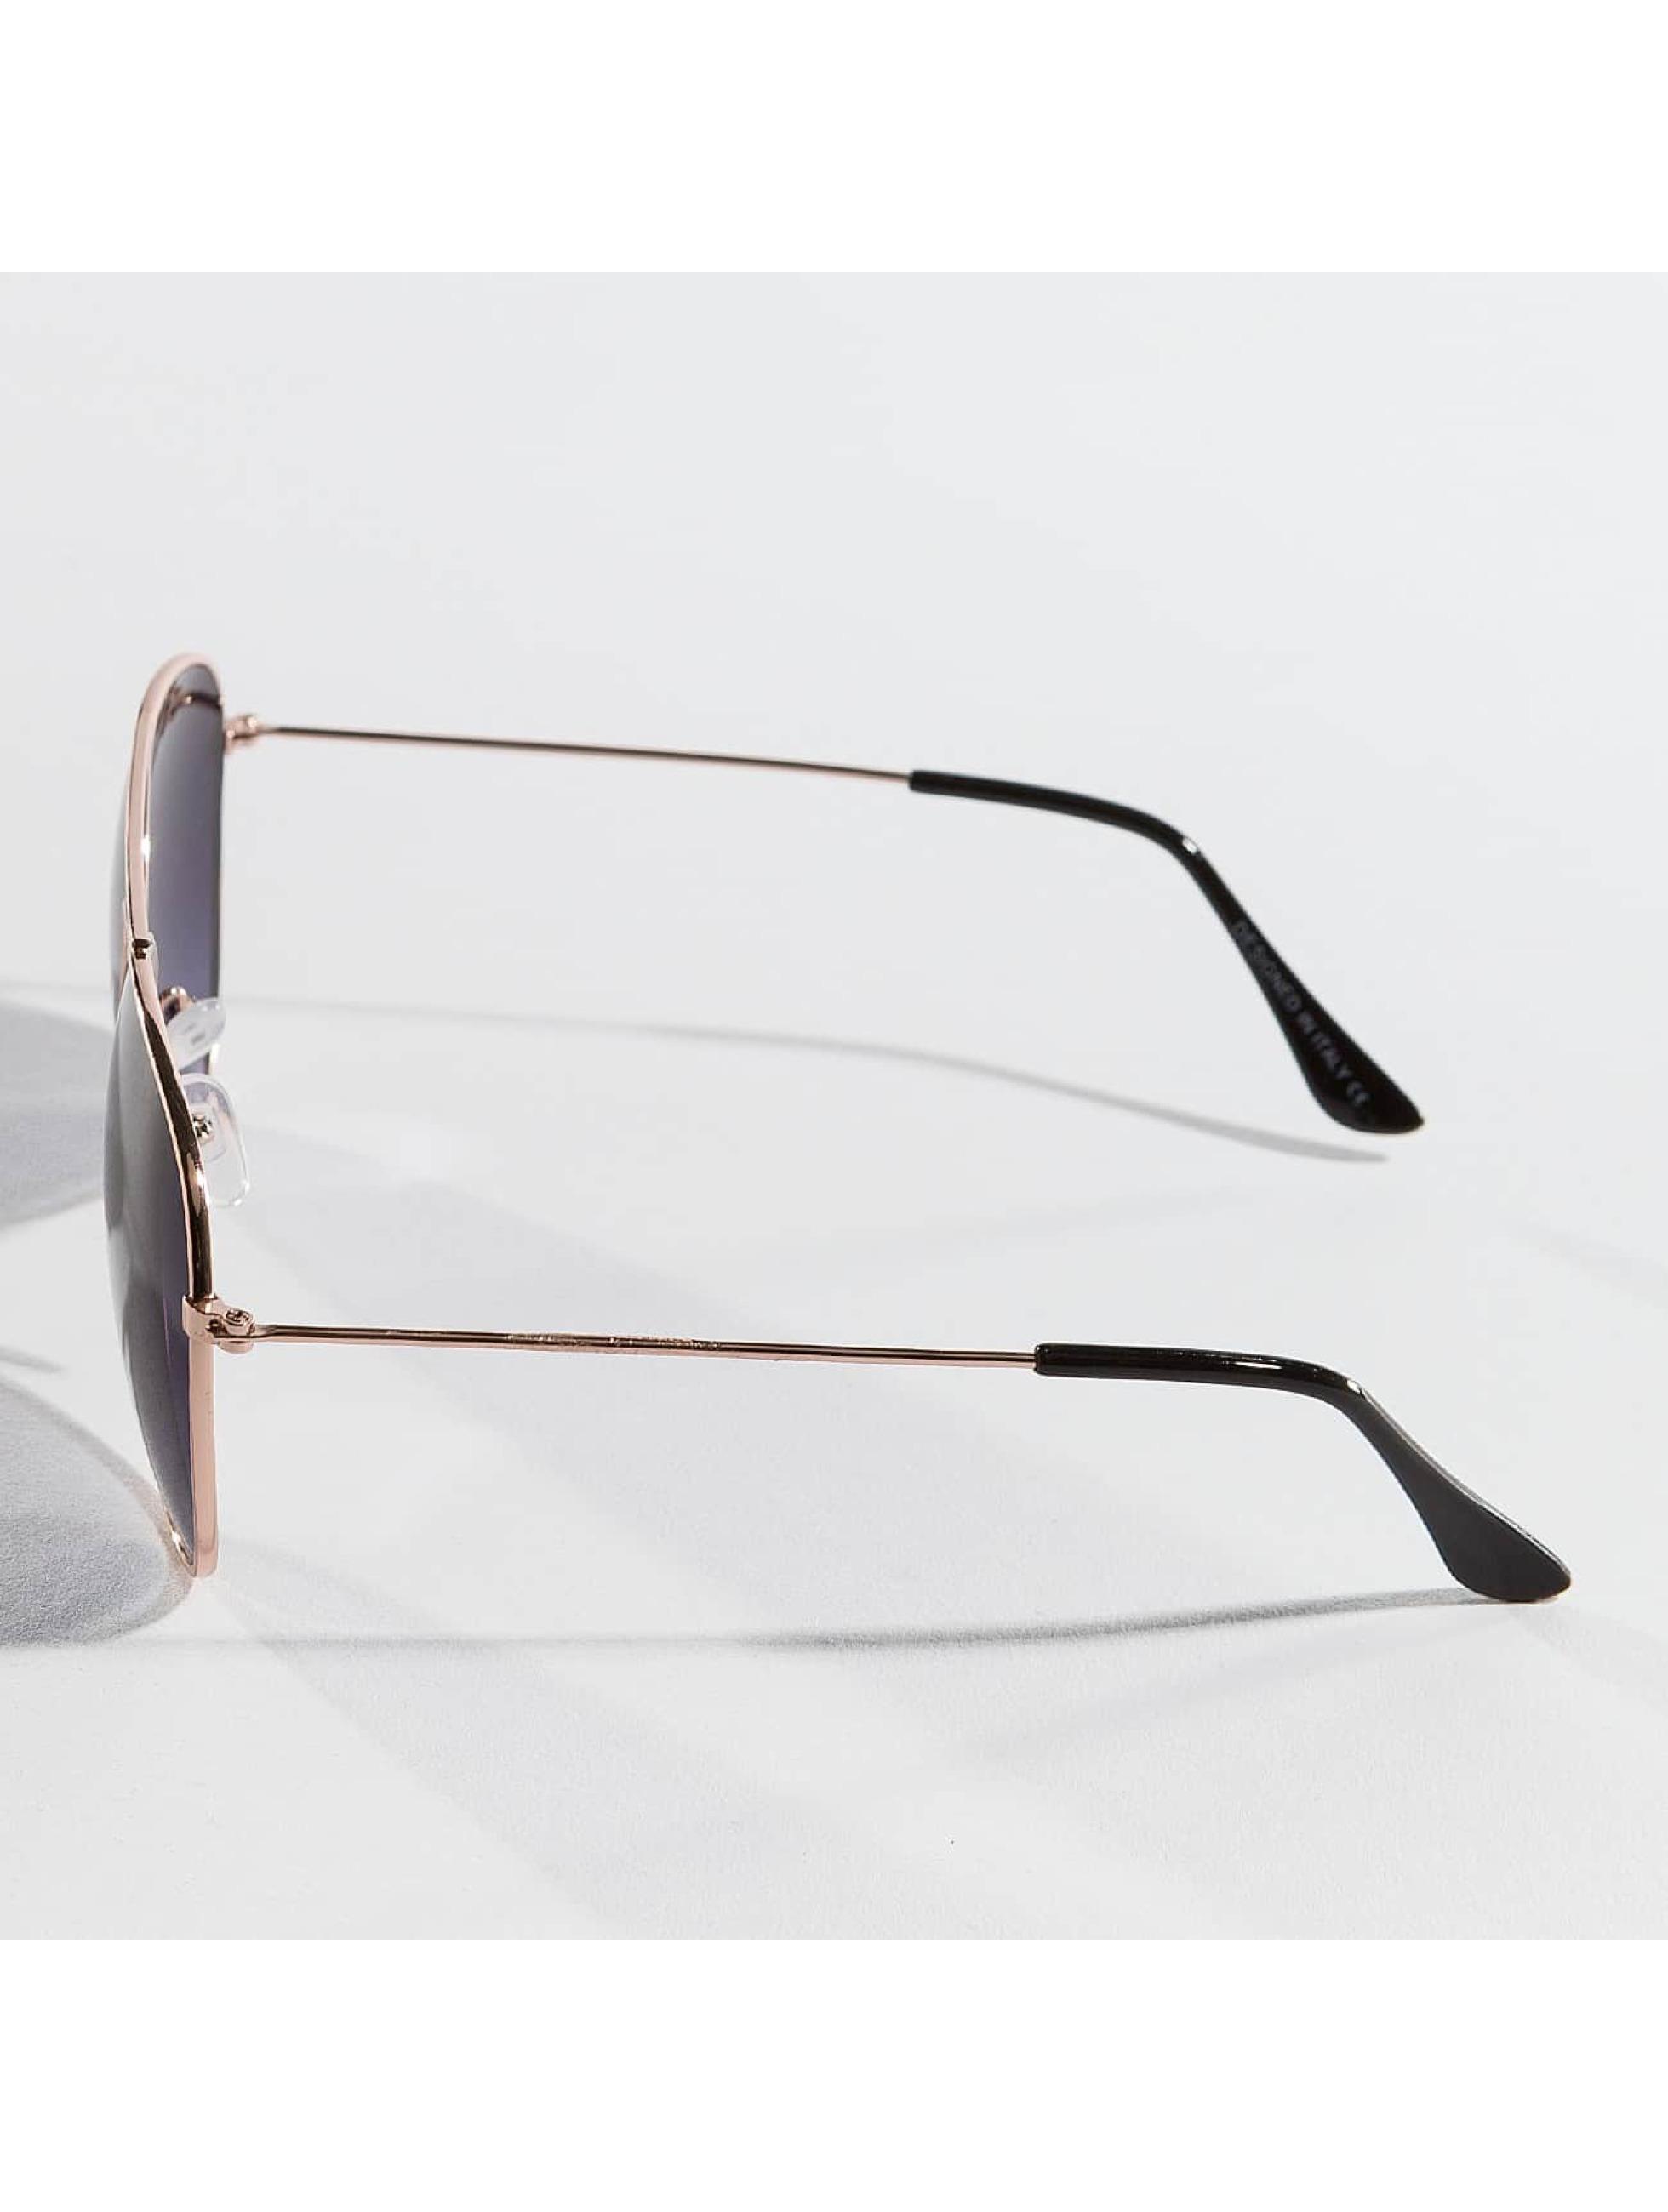 Hailys Sunglasses Pilot rose